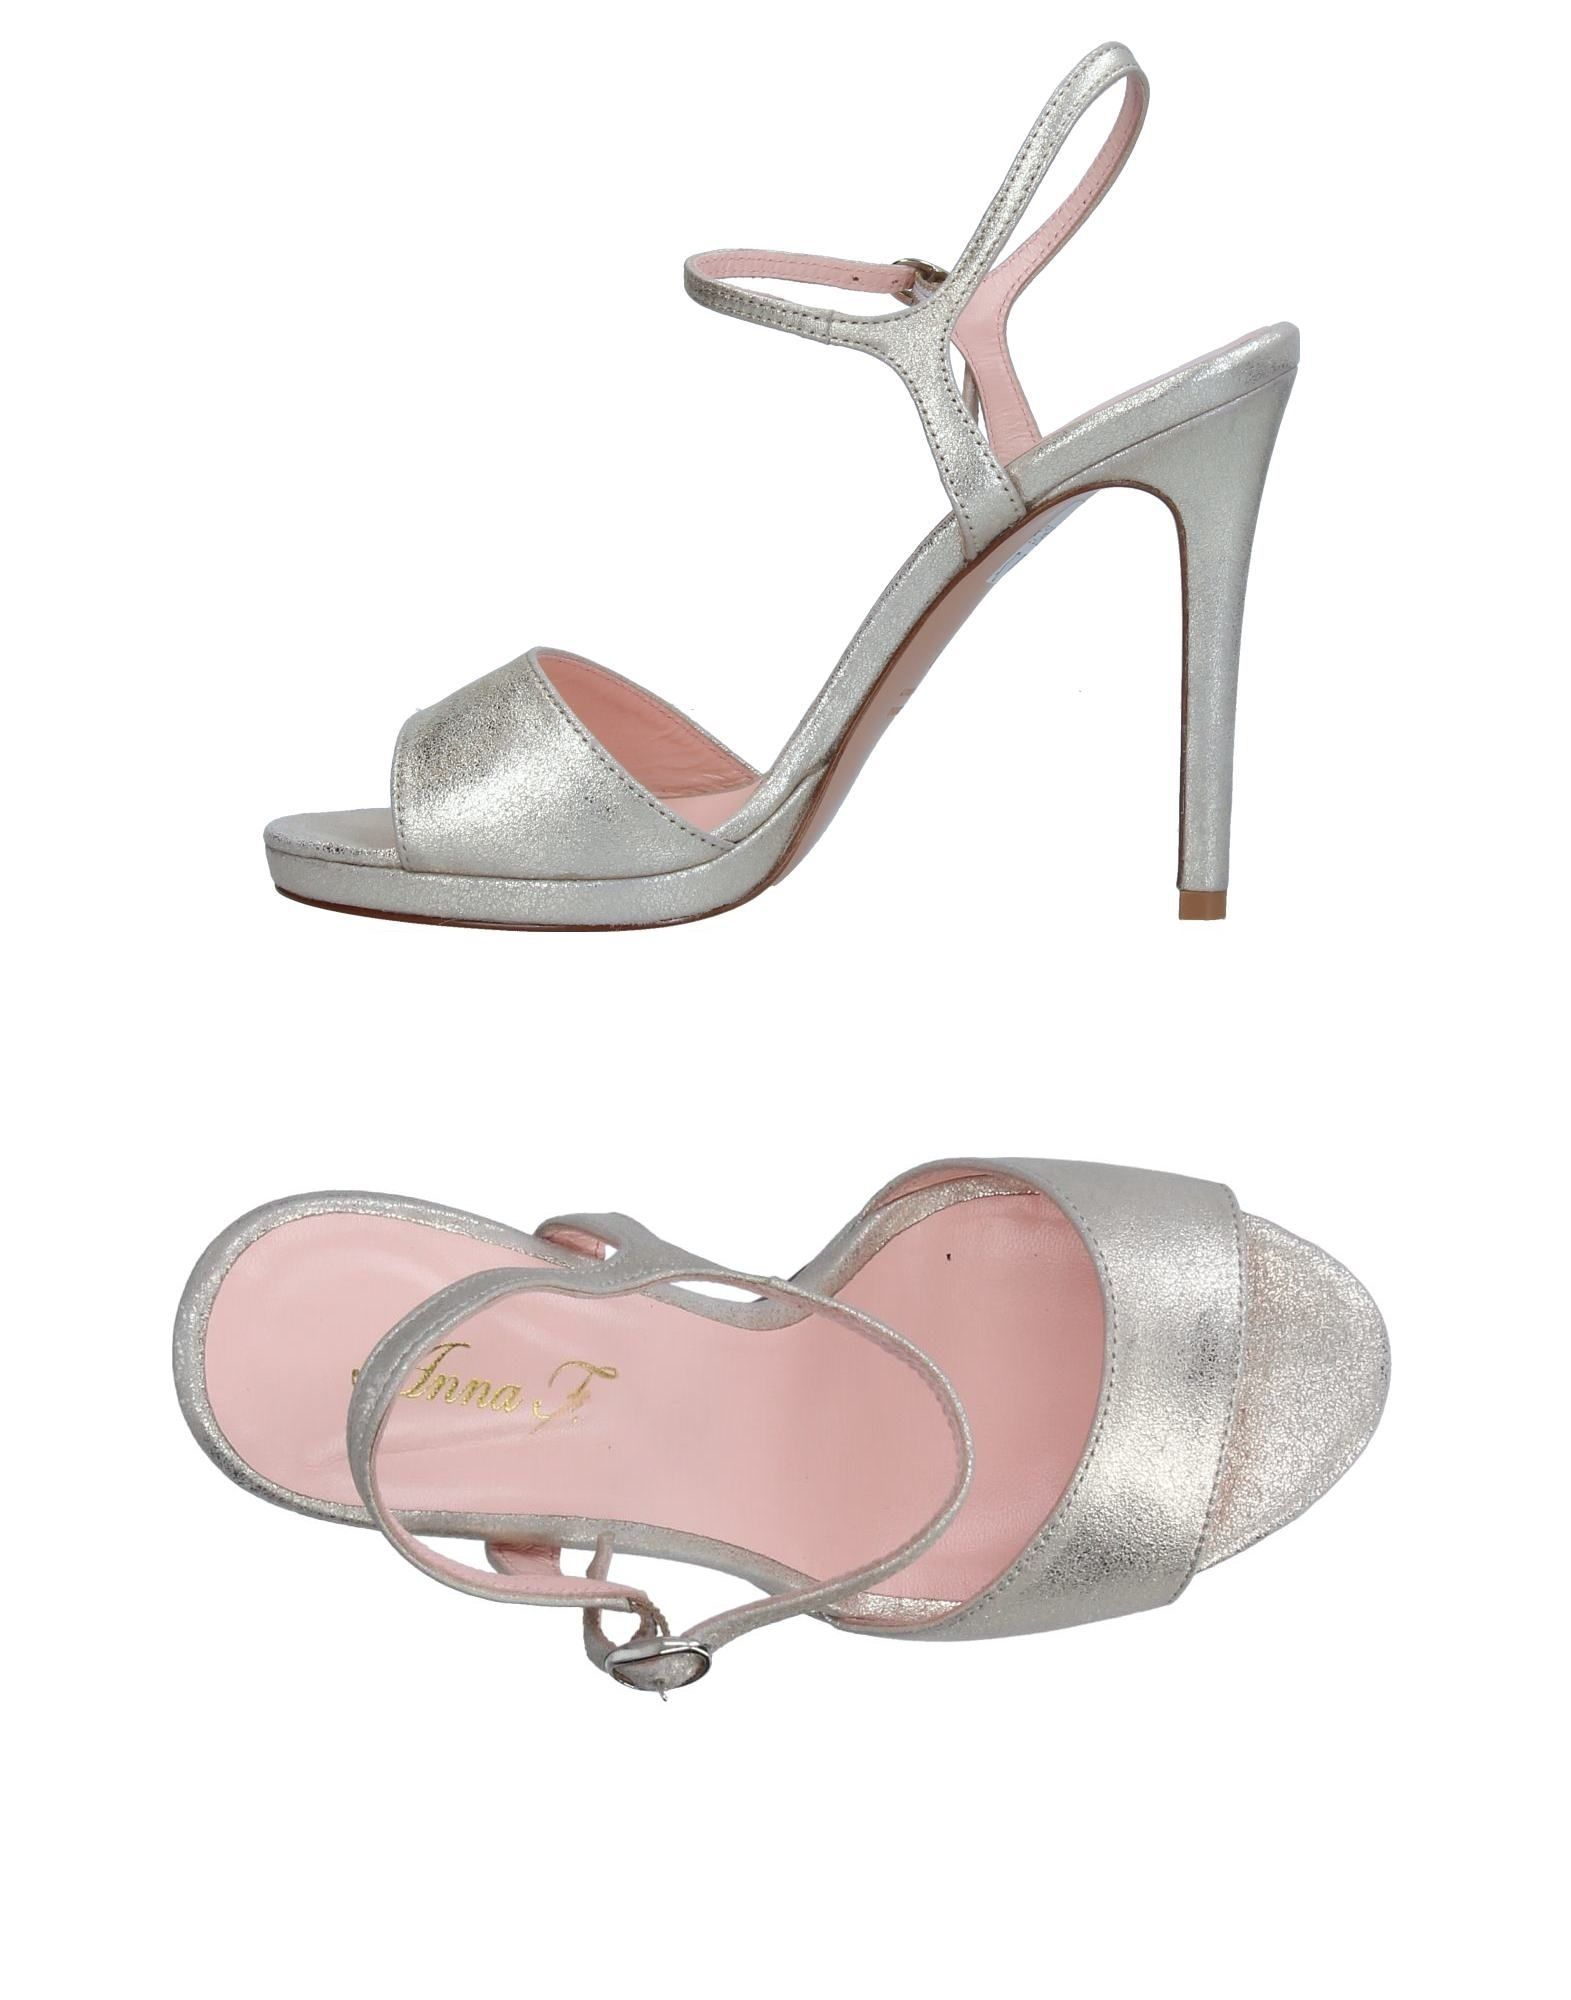 Anna F. Sandalen Damen  11359700MM Gute Qualität beliebte Schuhe